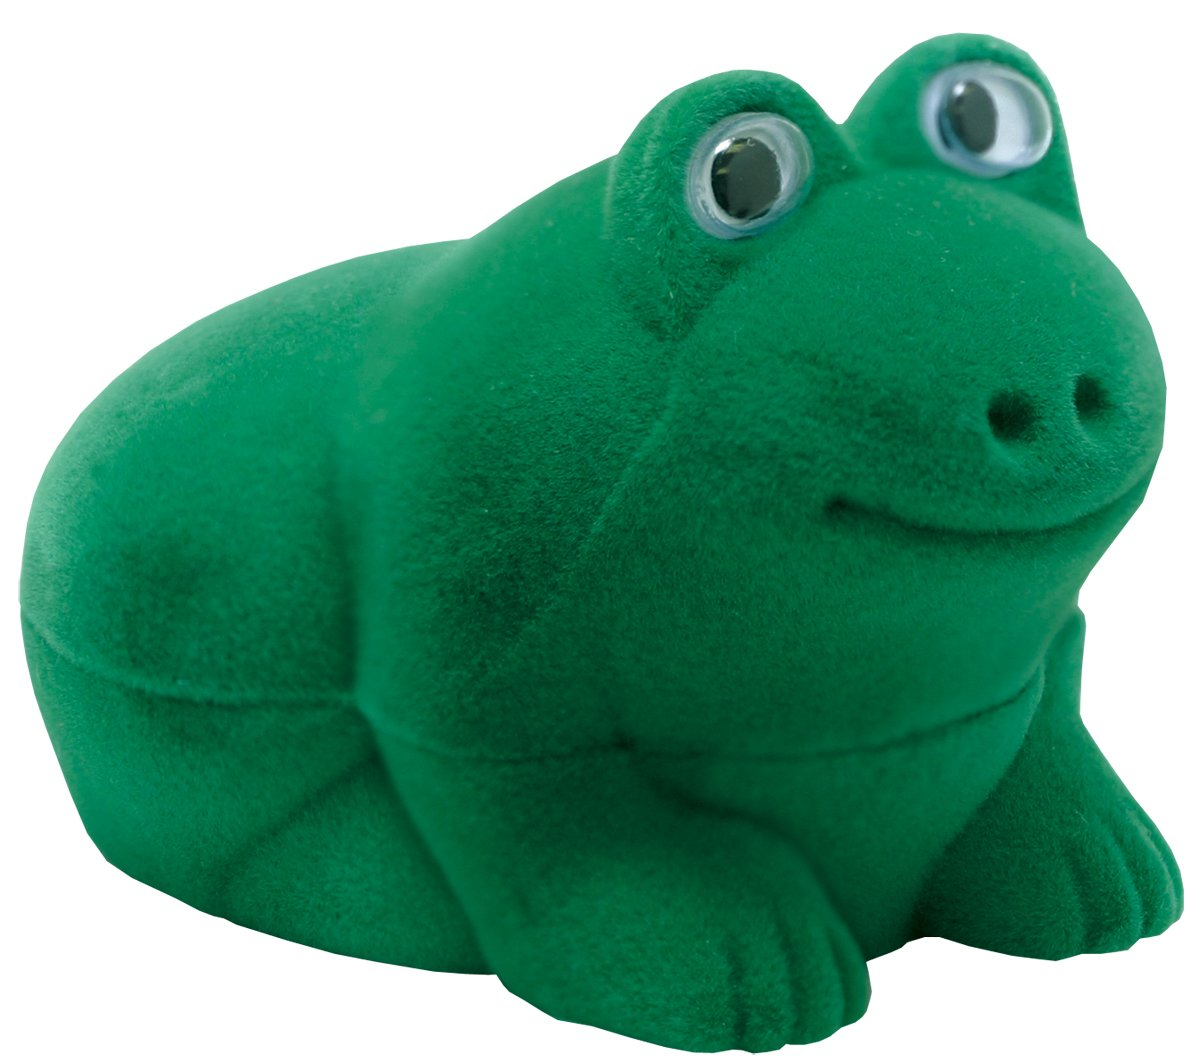 Cute Frog Pendant